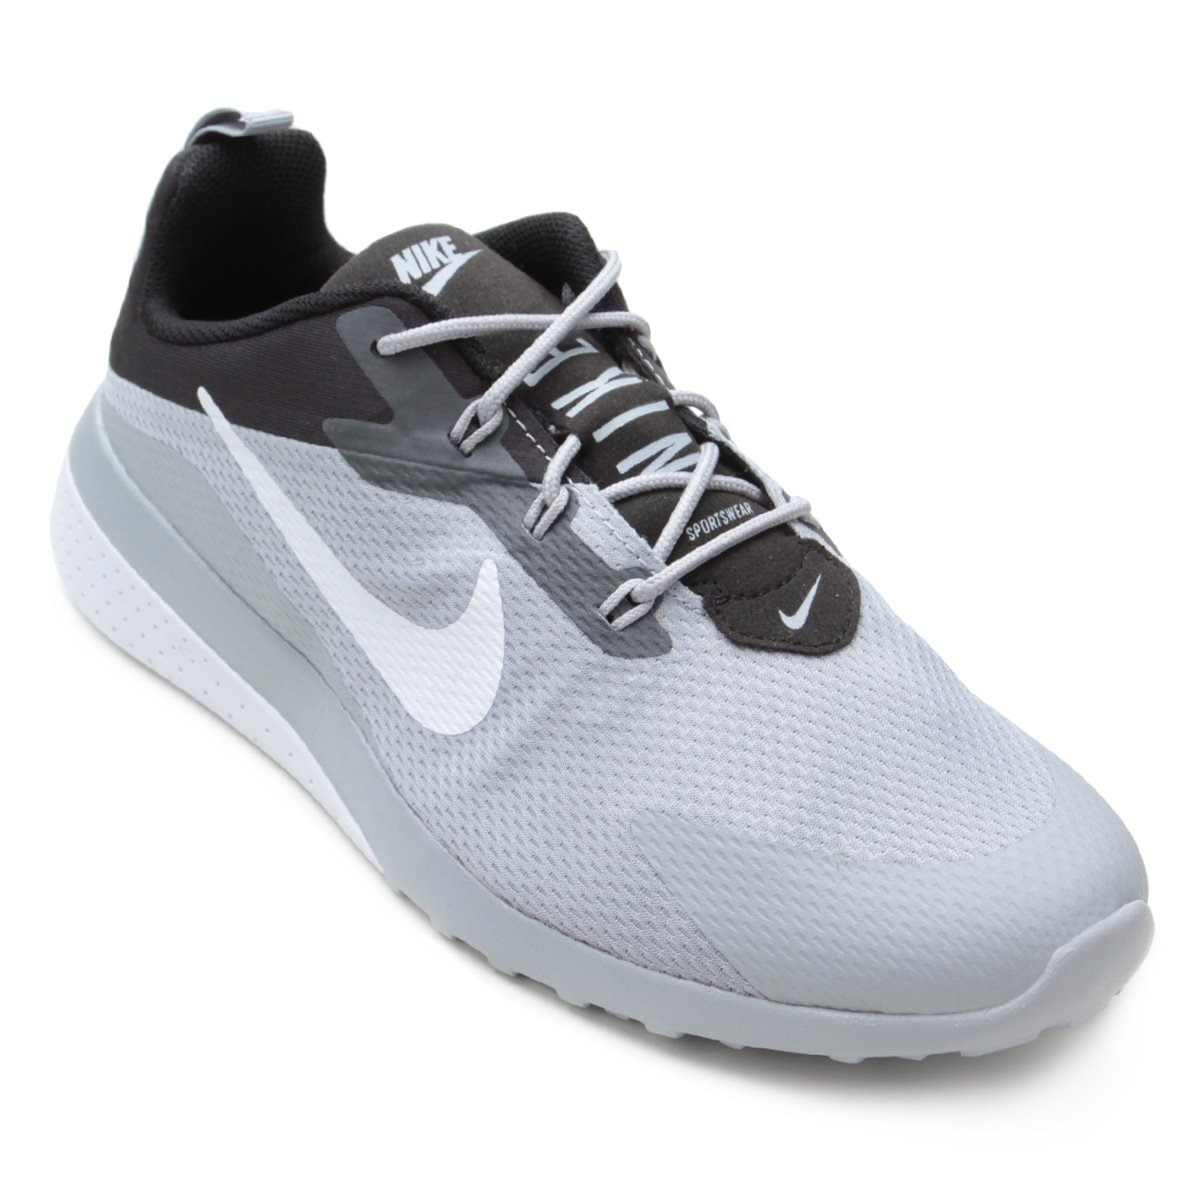 2e1c24c5b5 Tênis Nike CK Racer 2 Masculino - Cinza e Preto - Compre Agora ...